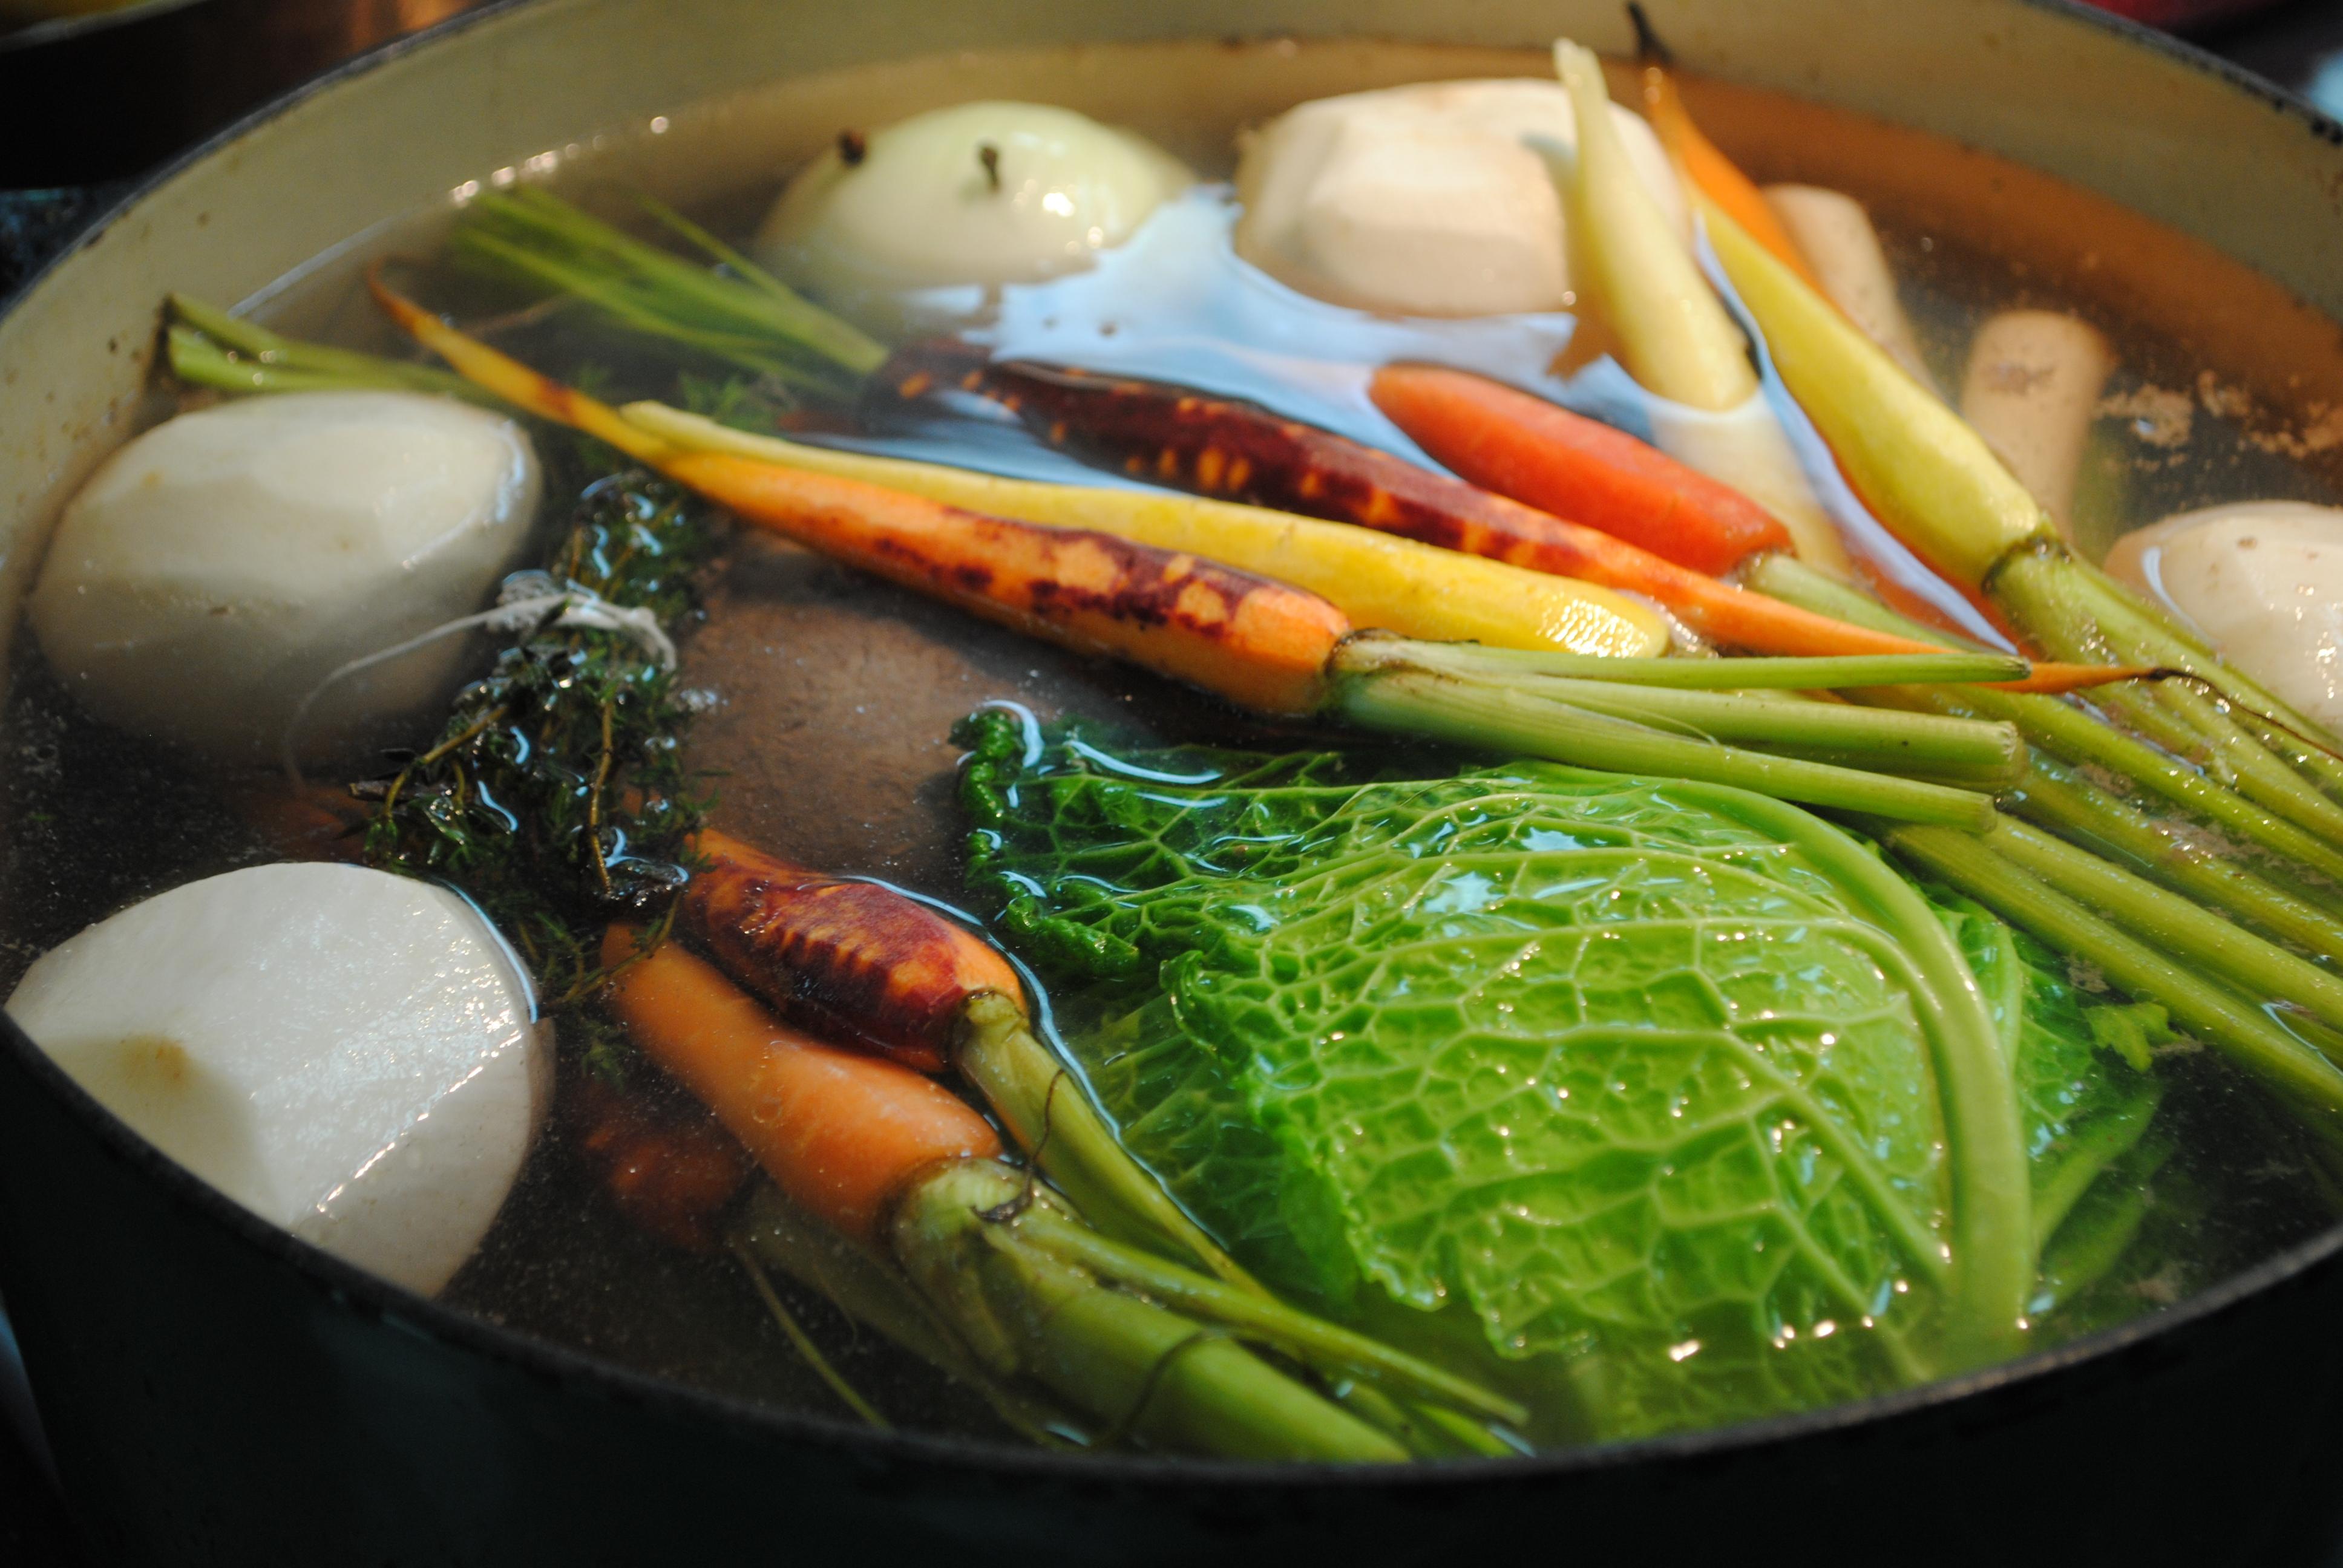 how to pot au feu by mathieu palombino sept 28 2010 southside csa